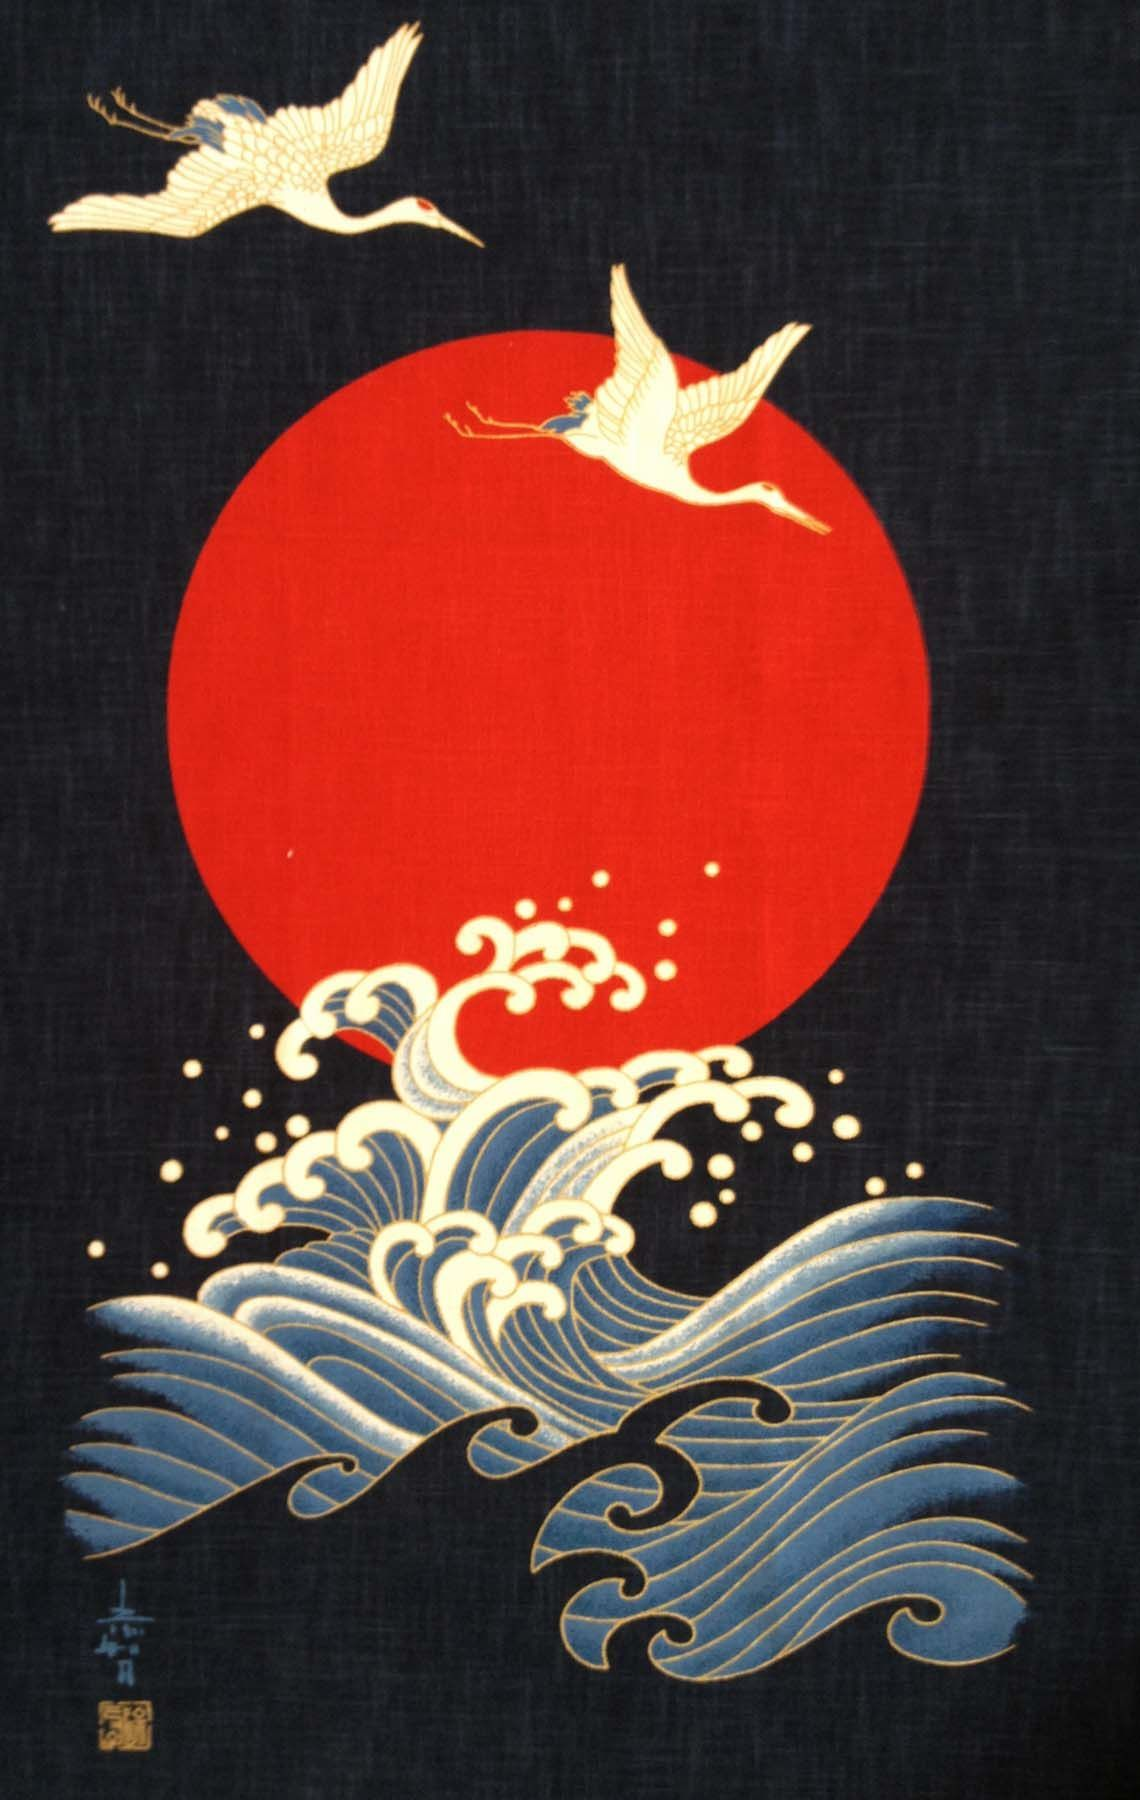 Japanese Textile Design Two Cranes And A Wave Japan Japanische Kunst Traditionelle Japanische Kunst Chinesische Kunst